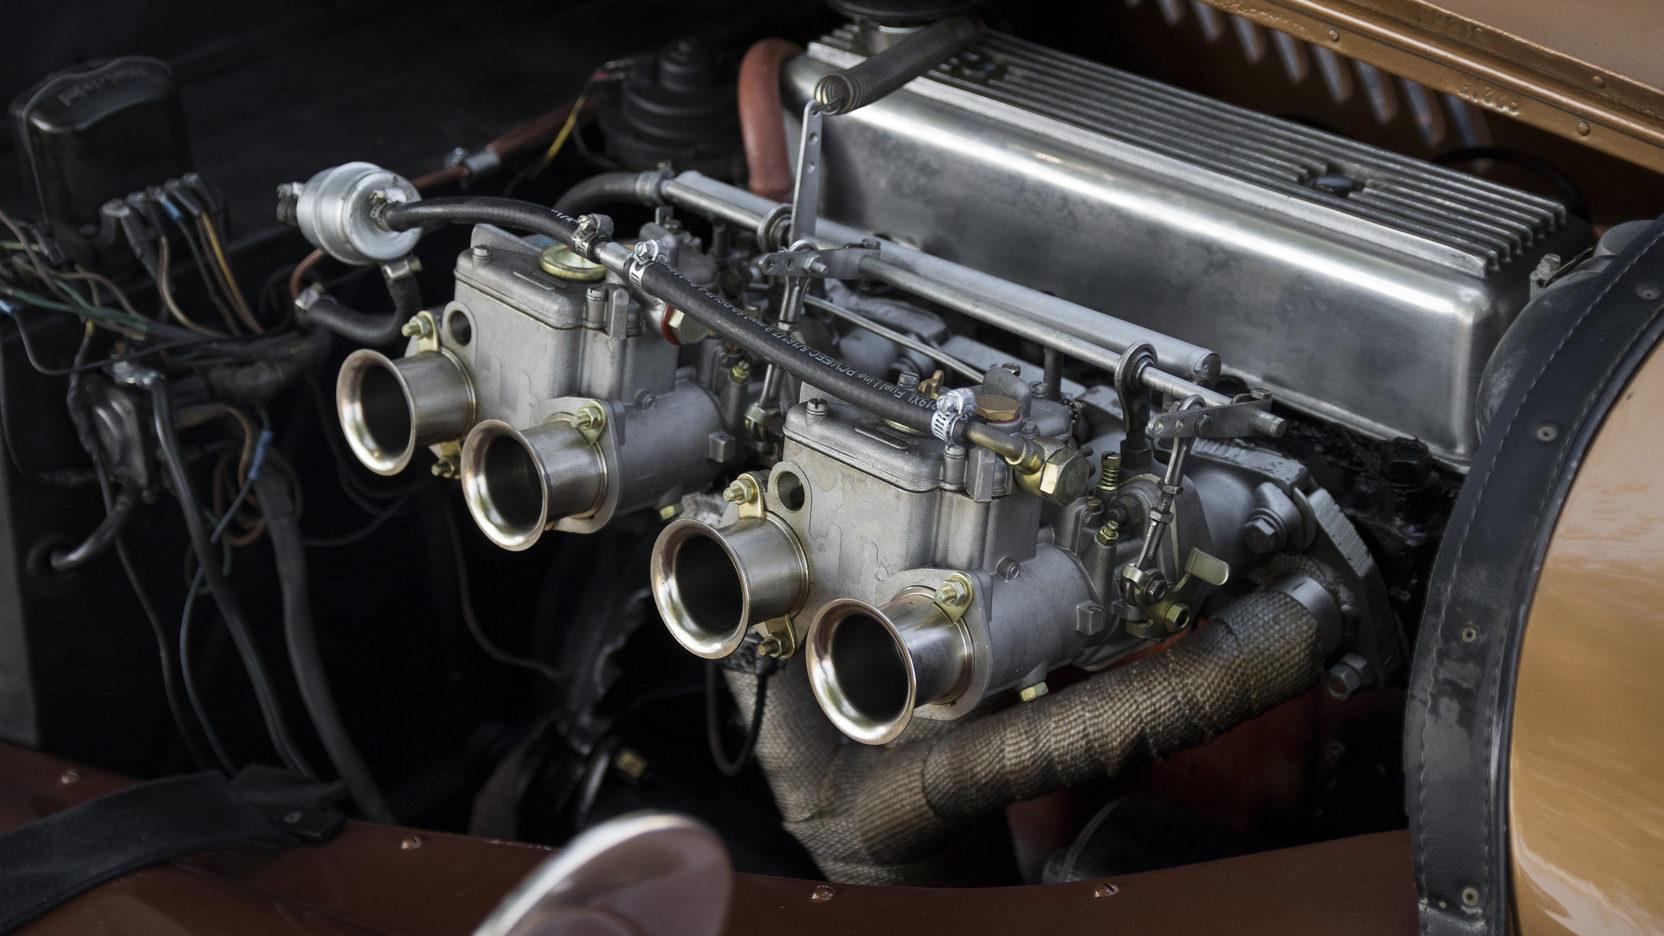 1962 Morgan Plus 4 Engine